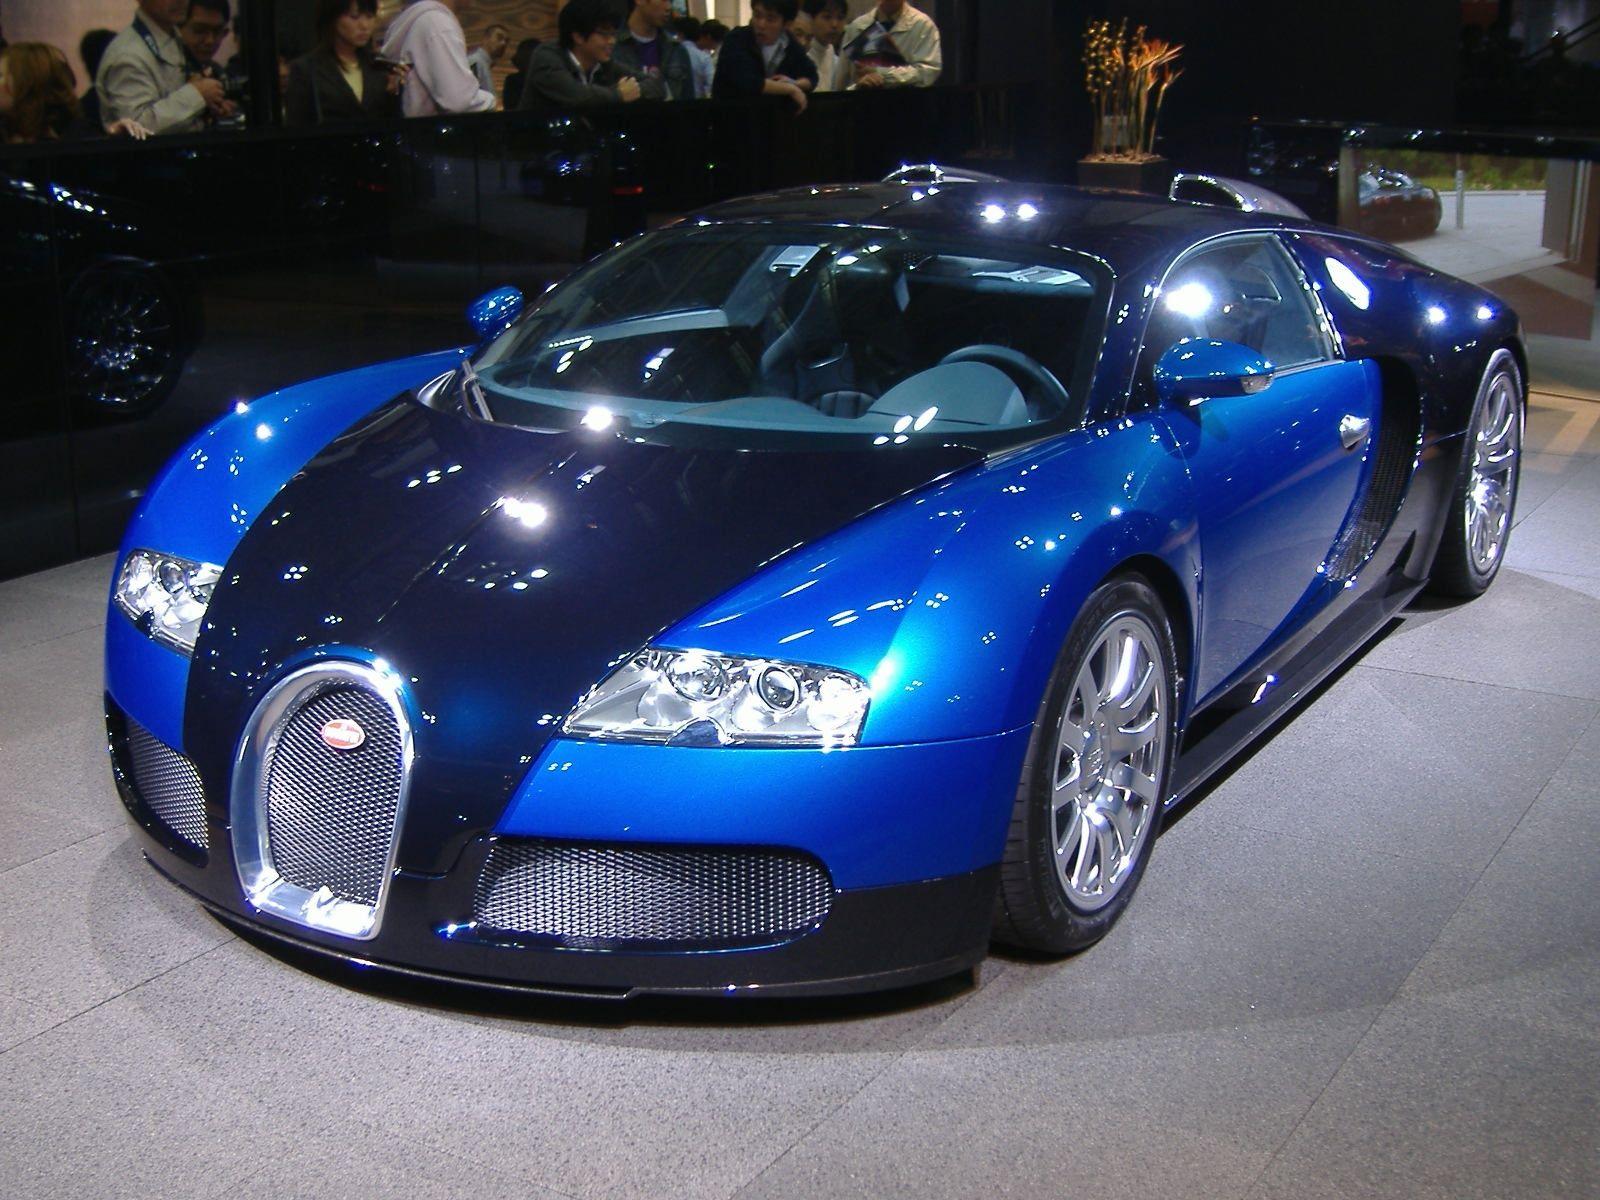 Soooo Pretty Bugatti Veyron Bugatti Bugatti Cars